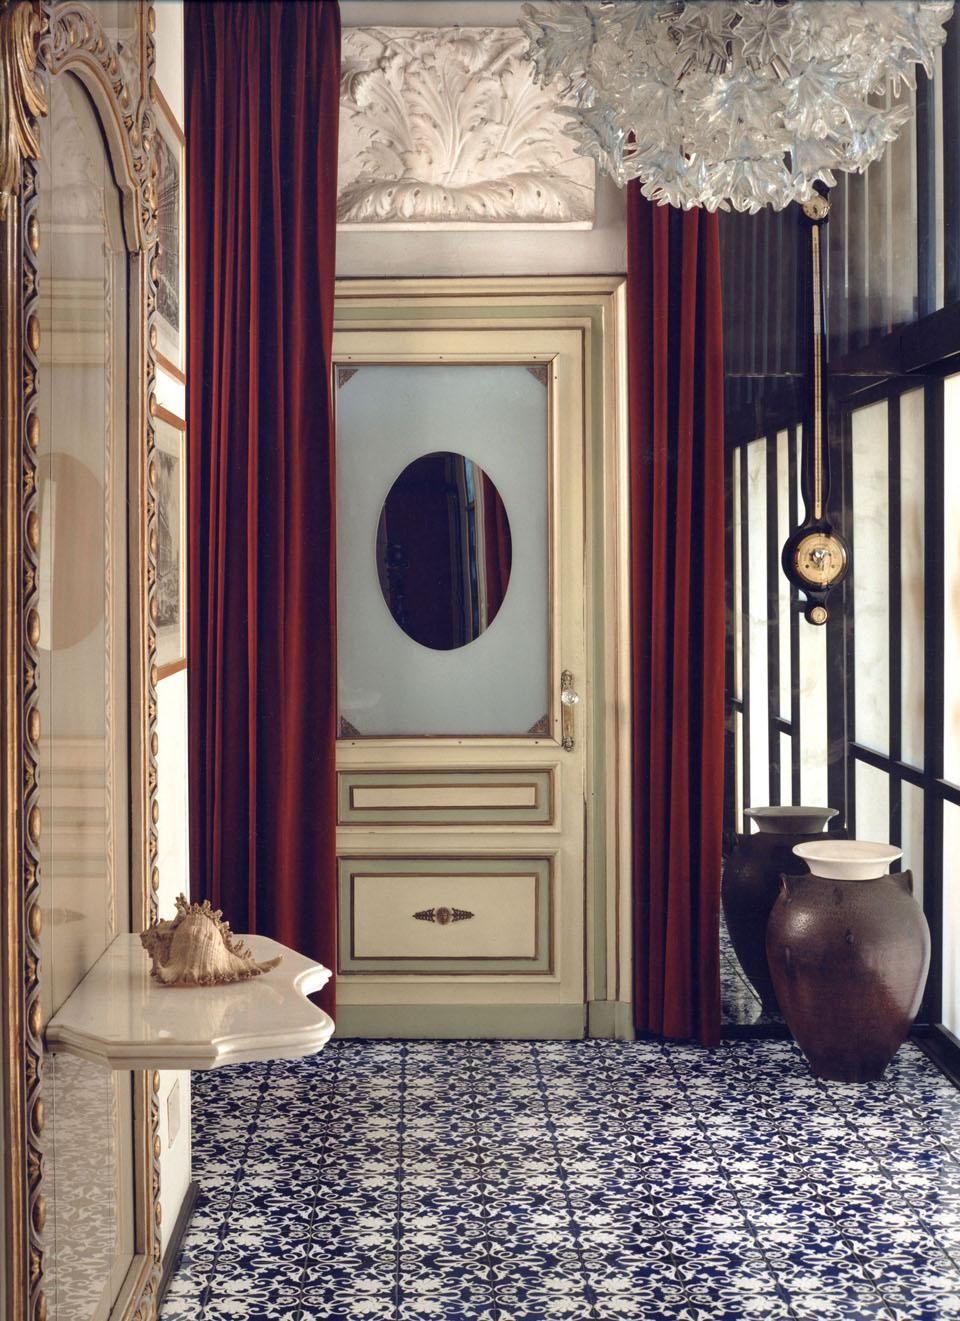 Casa mollino una casa museo a torino pavimento in for Casa moderna a torino